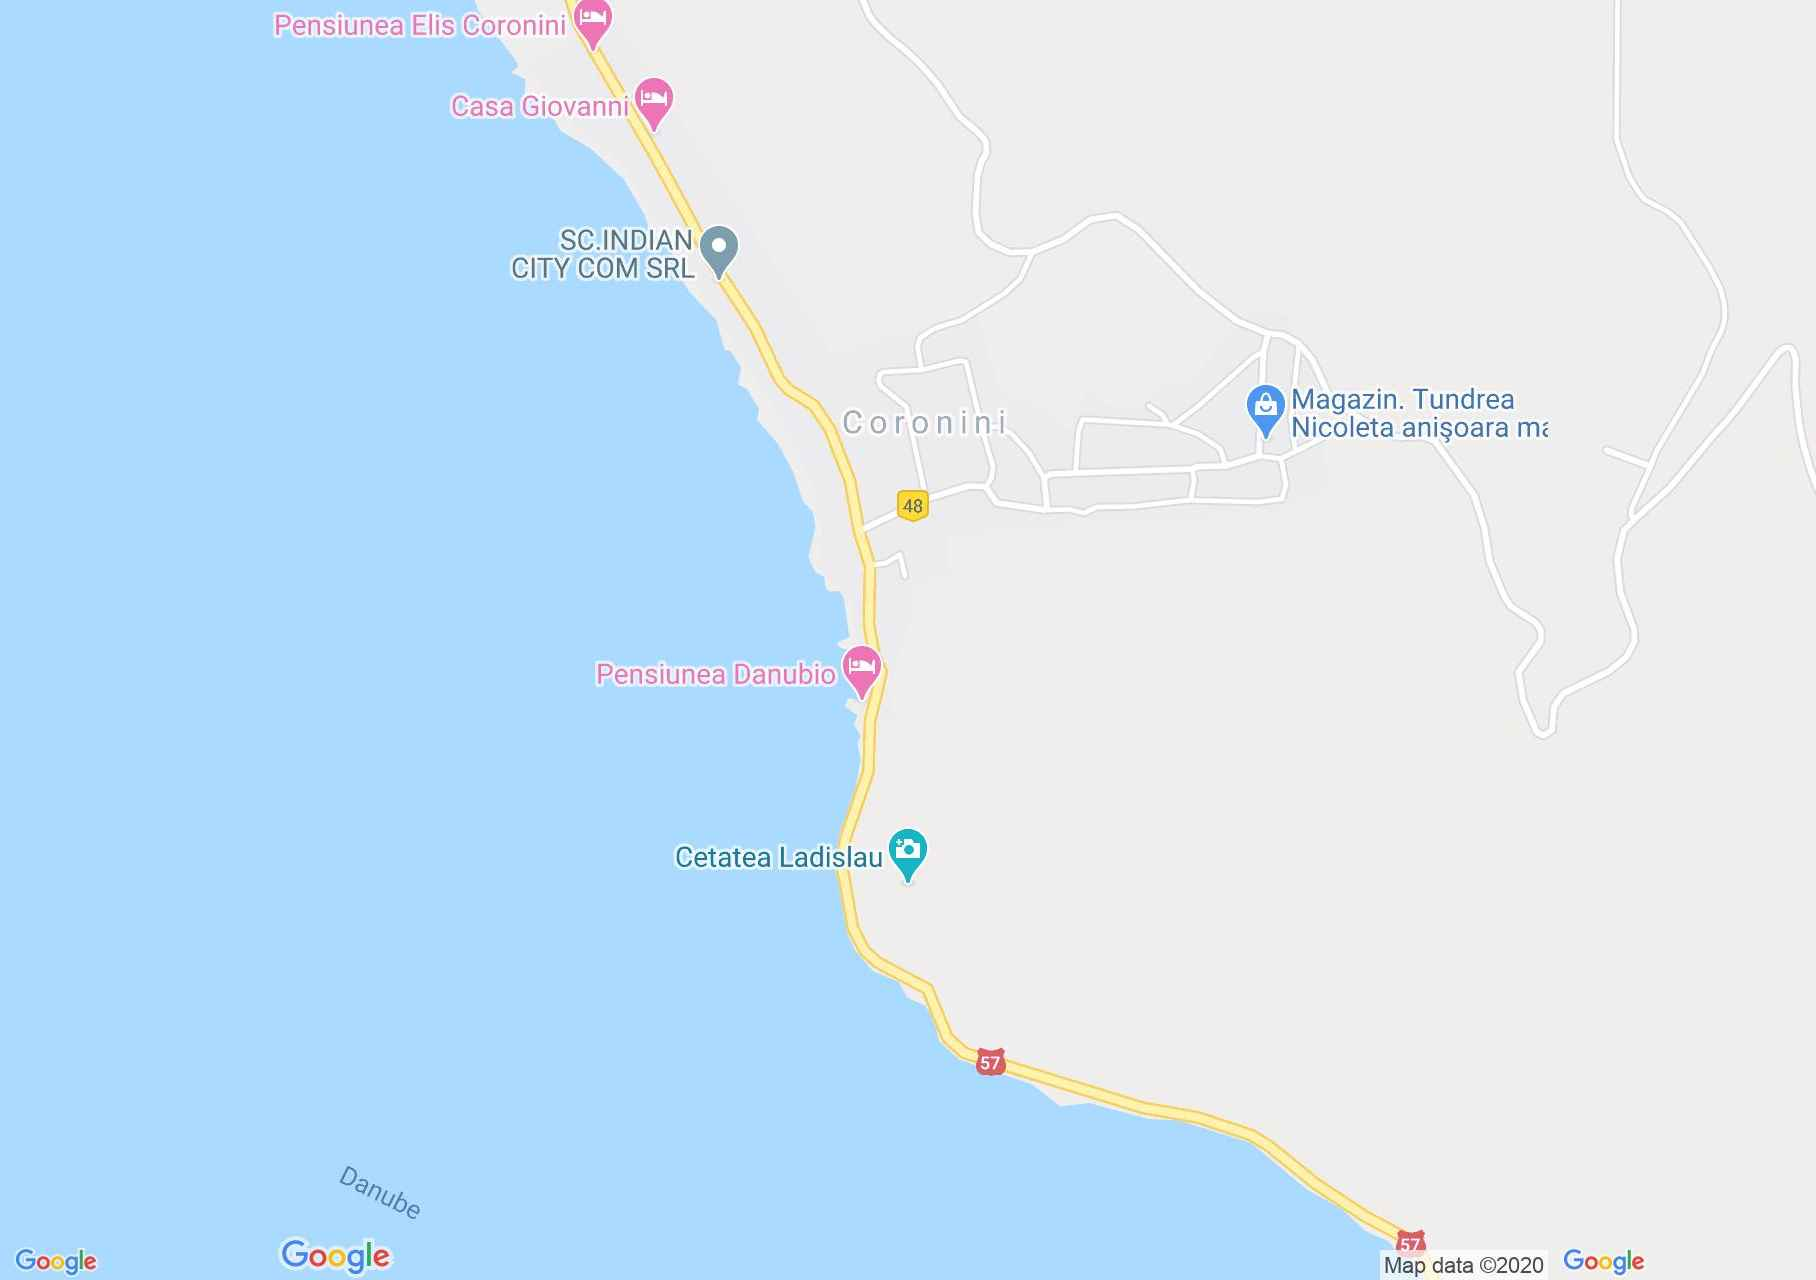 Coronini, Interactive tourist map